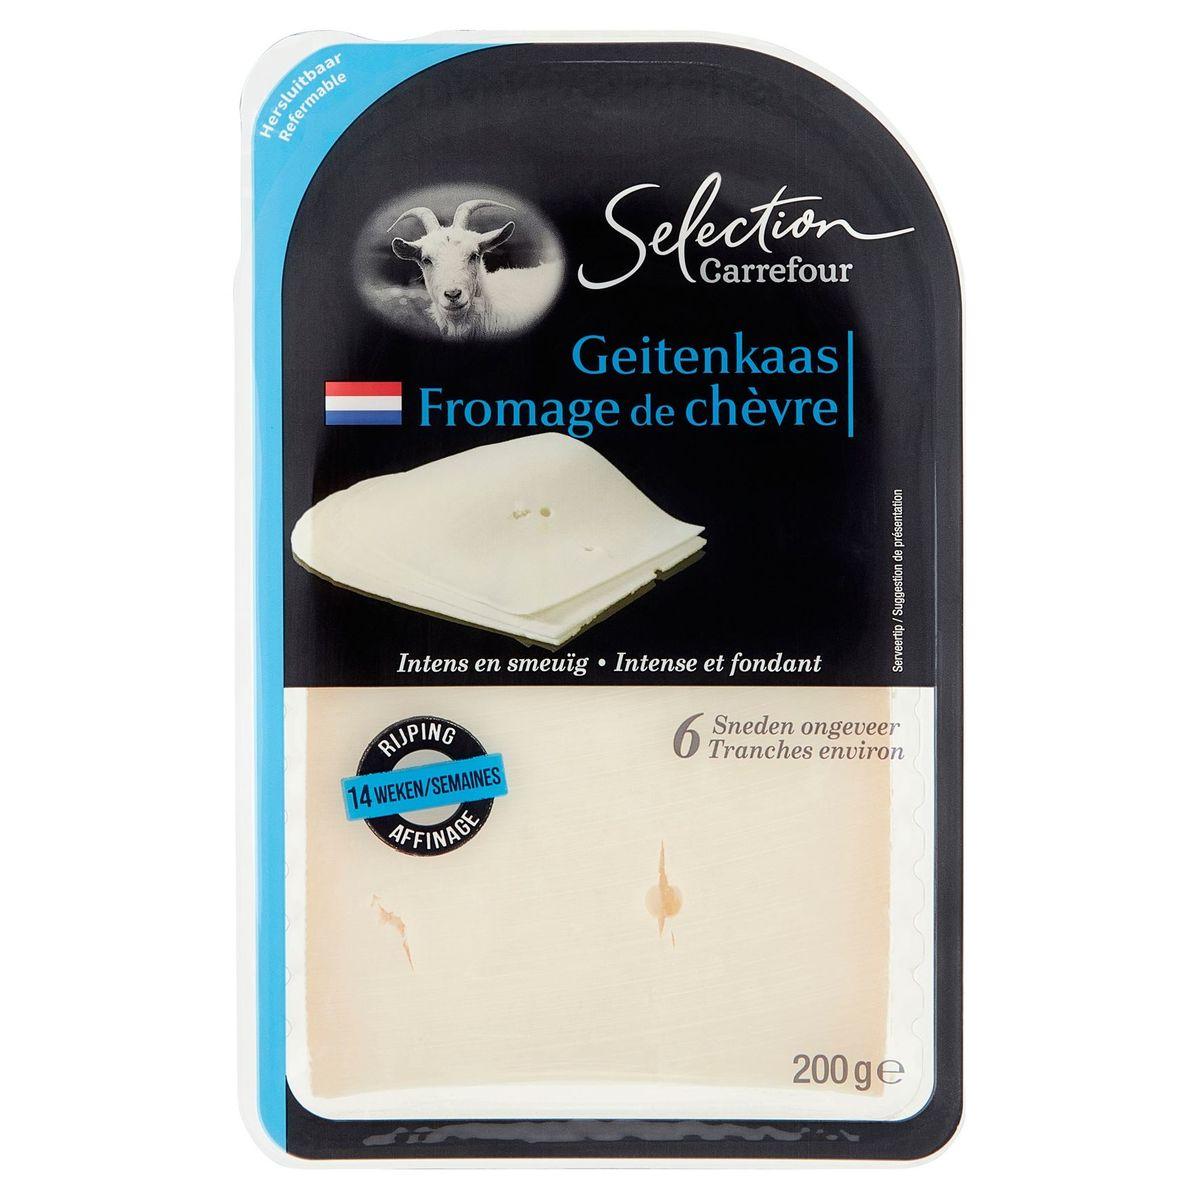 Carrefour Selection Fromage de Chèvre 8 Tranches Environ 200 g